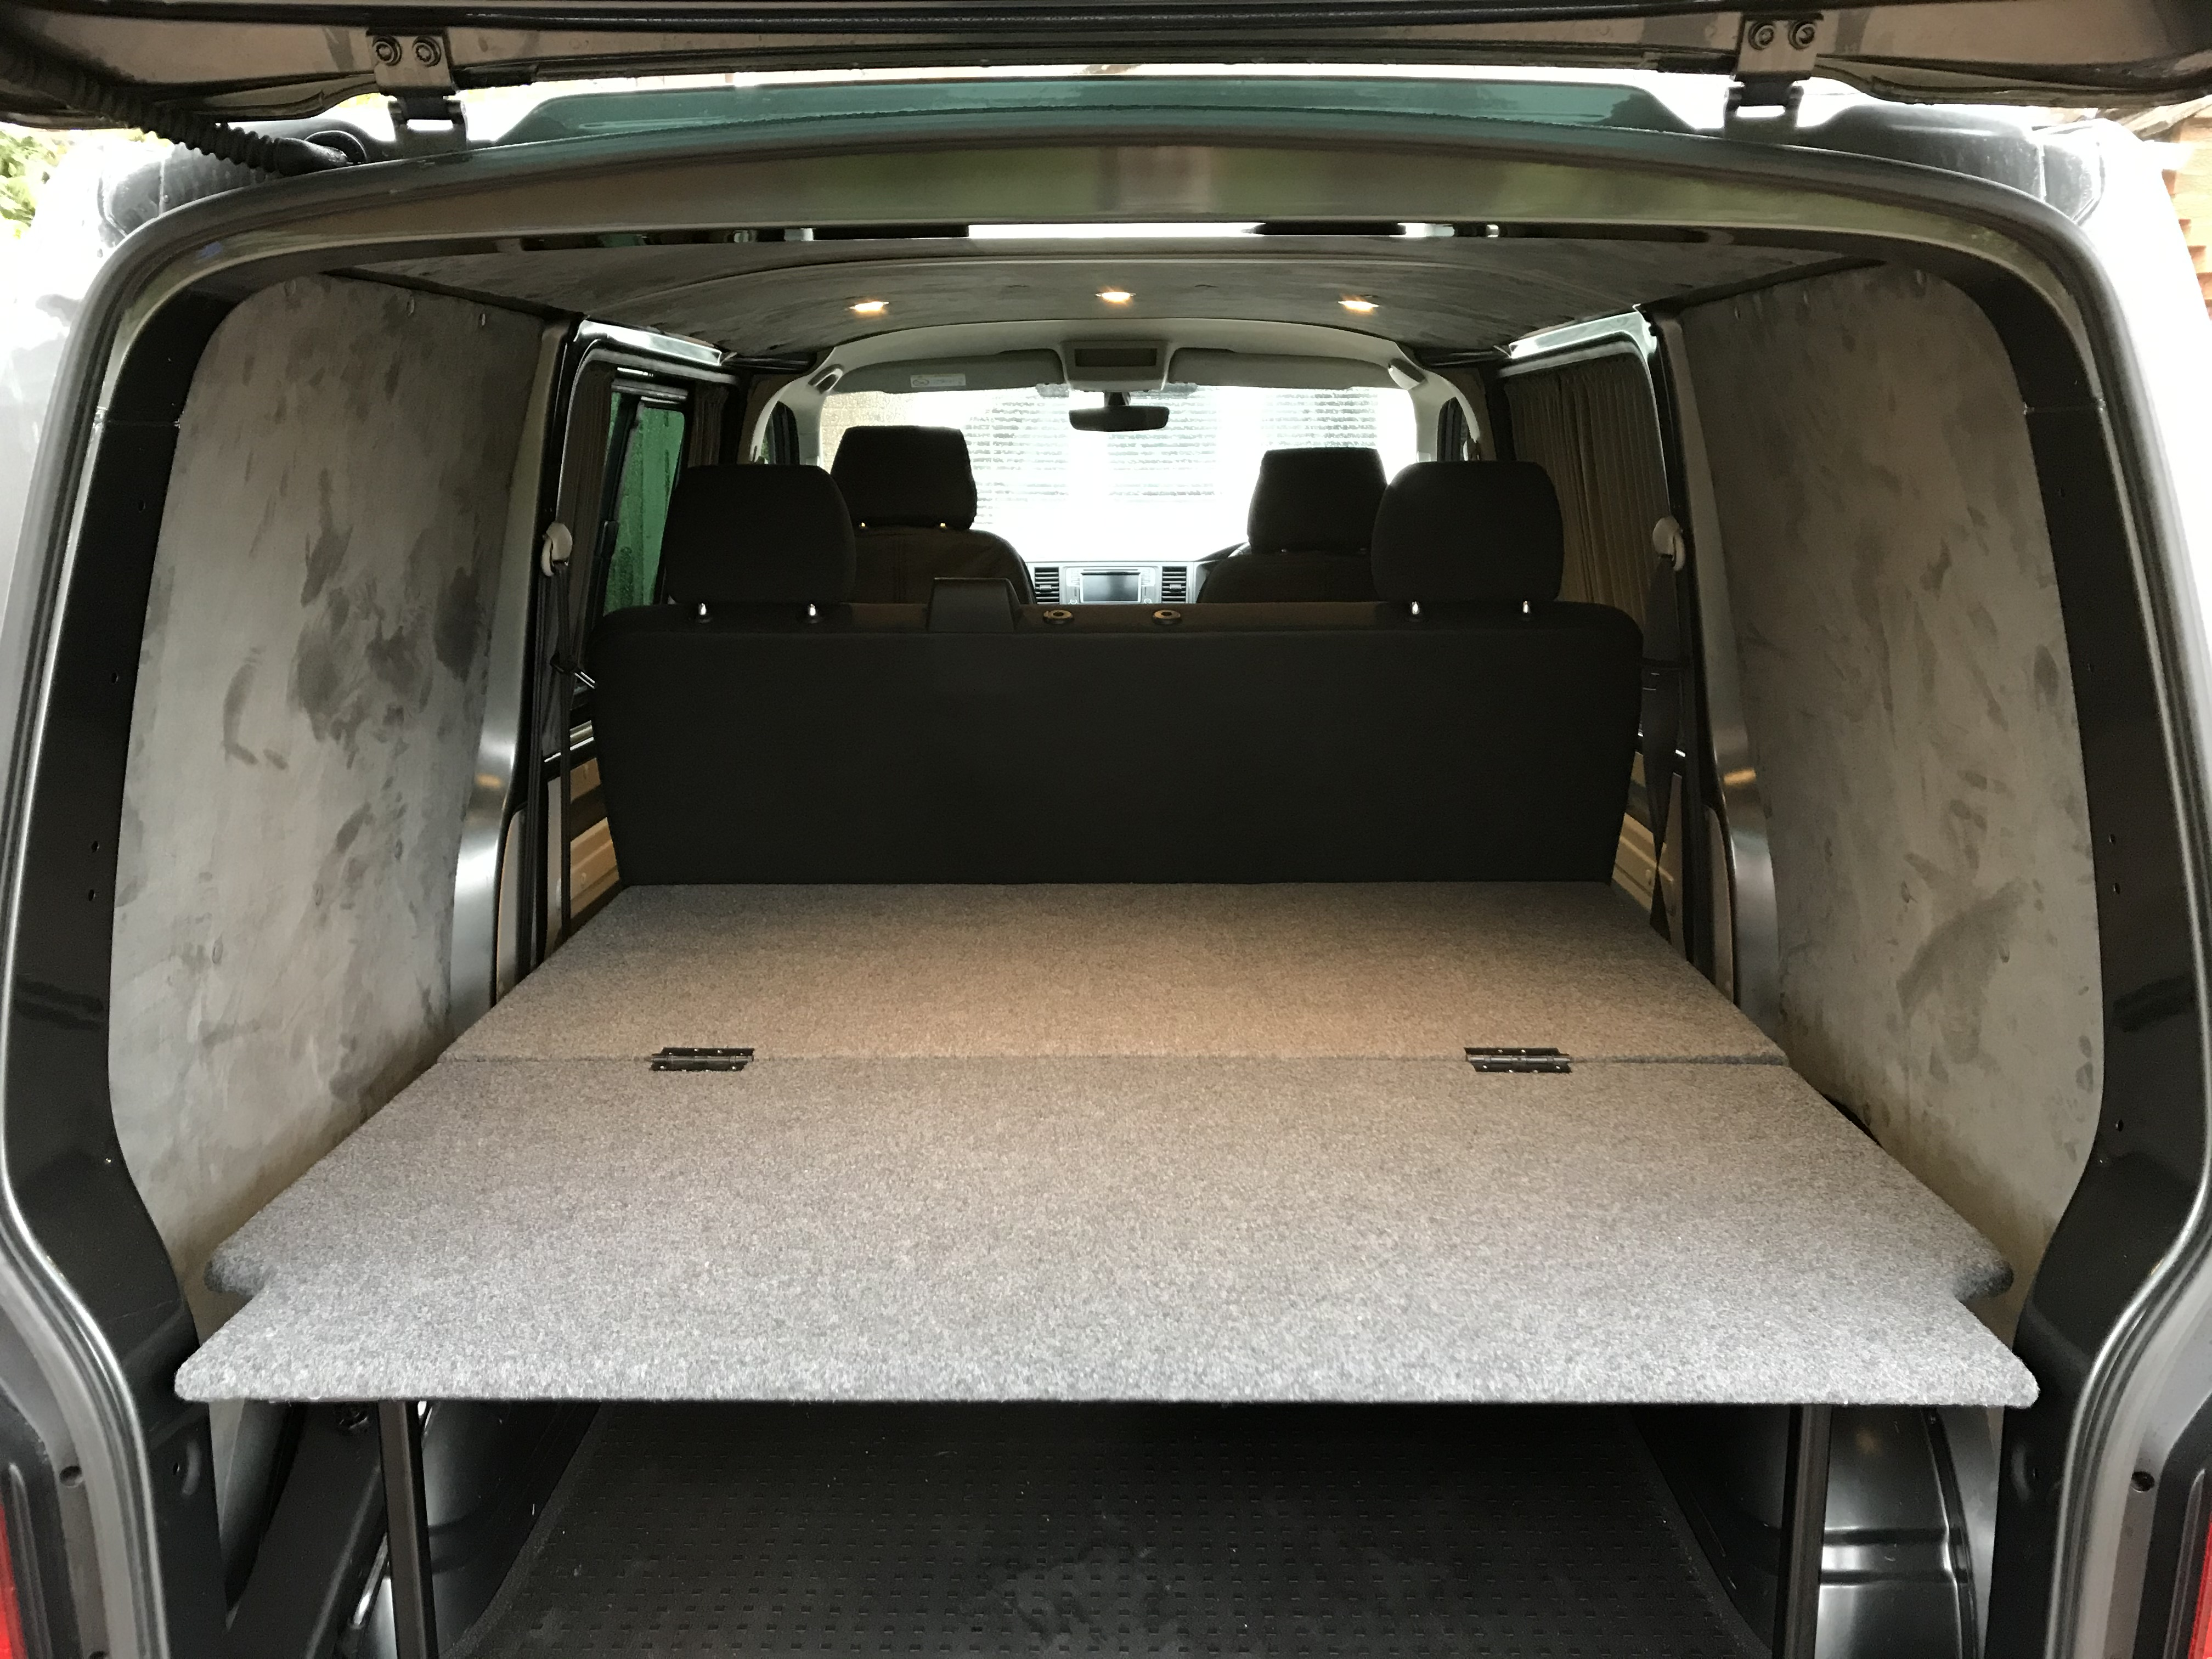 Rear combi bed